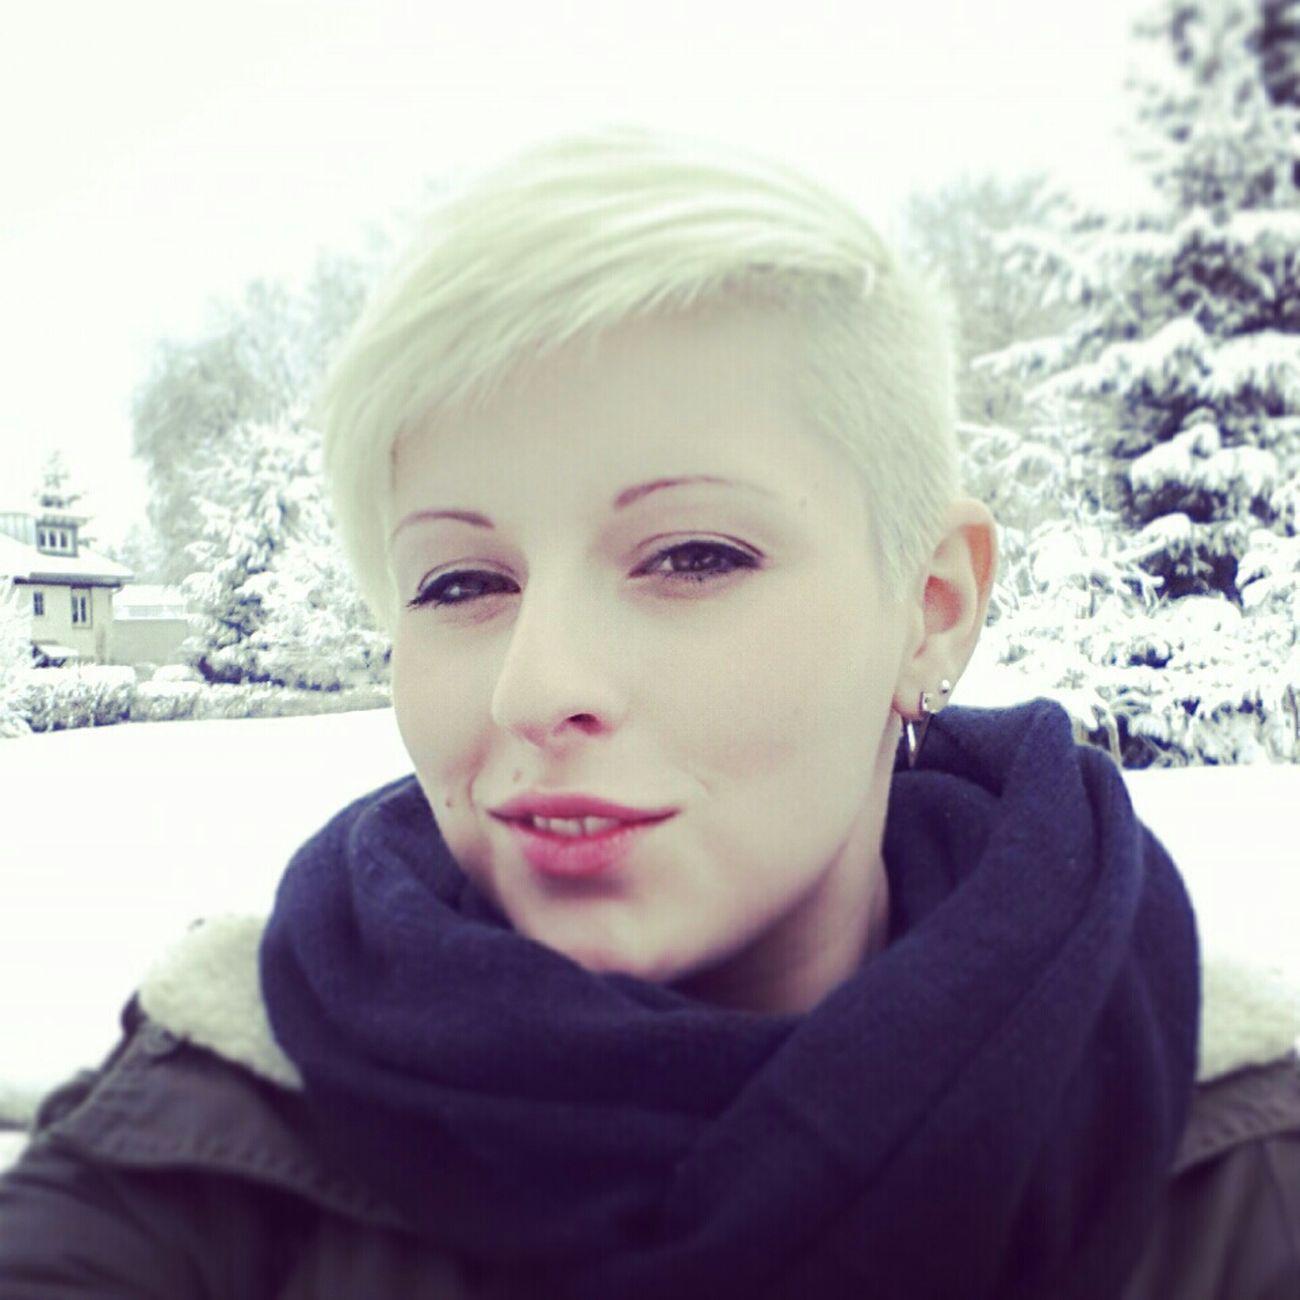 Snow is everywere :)